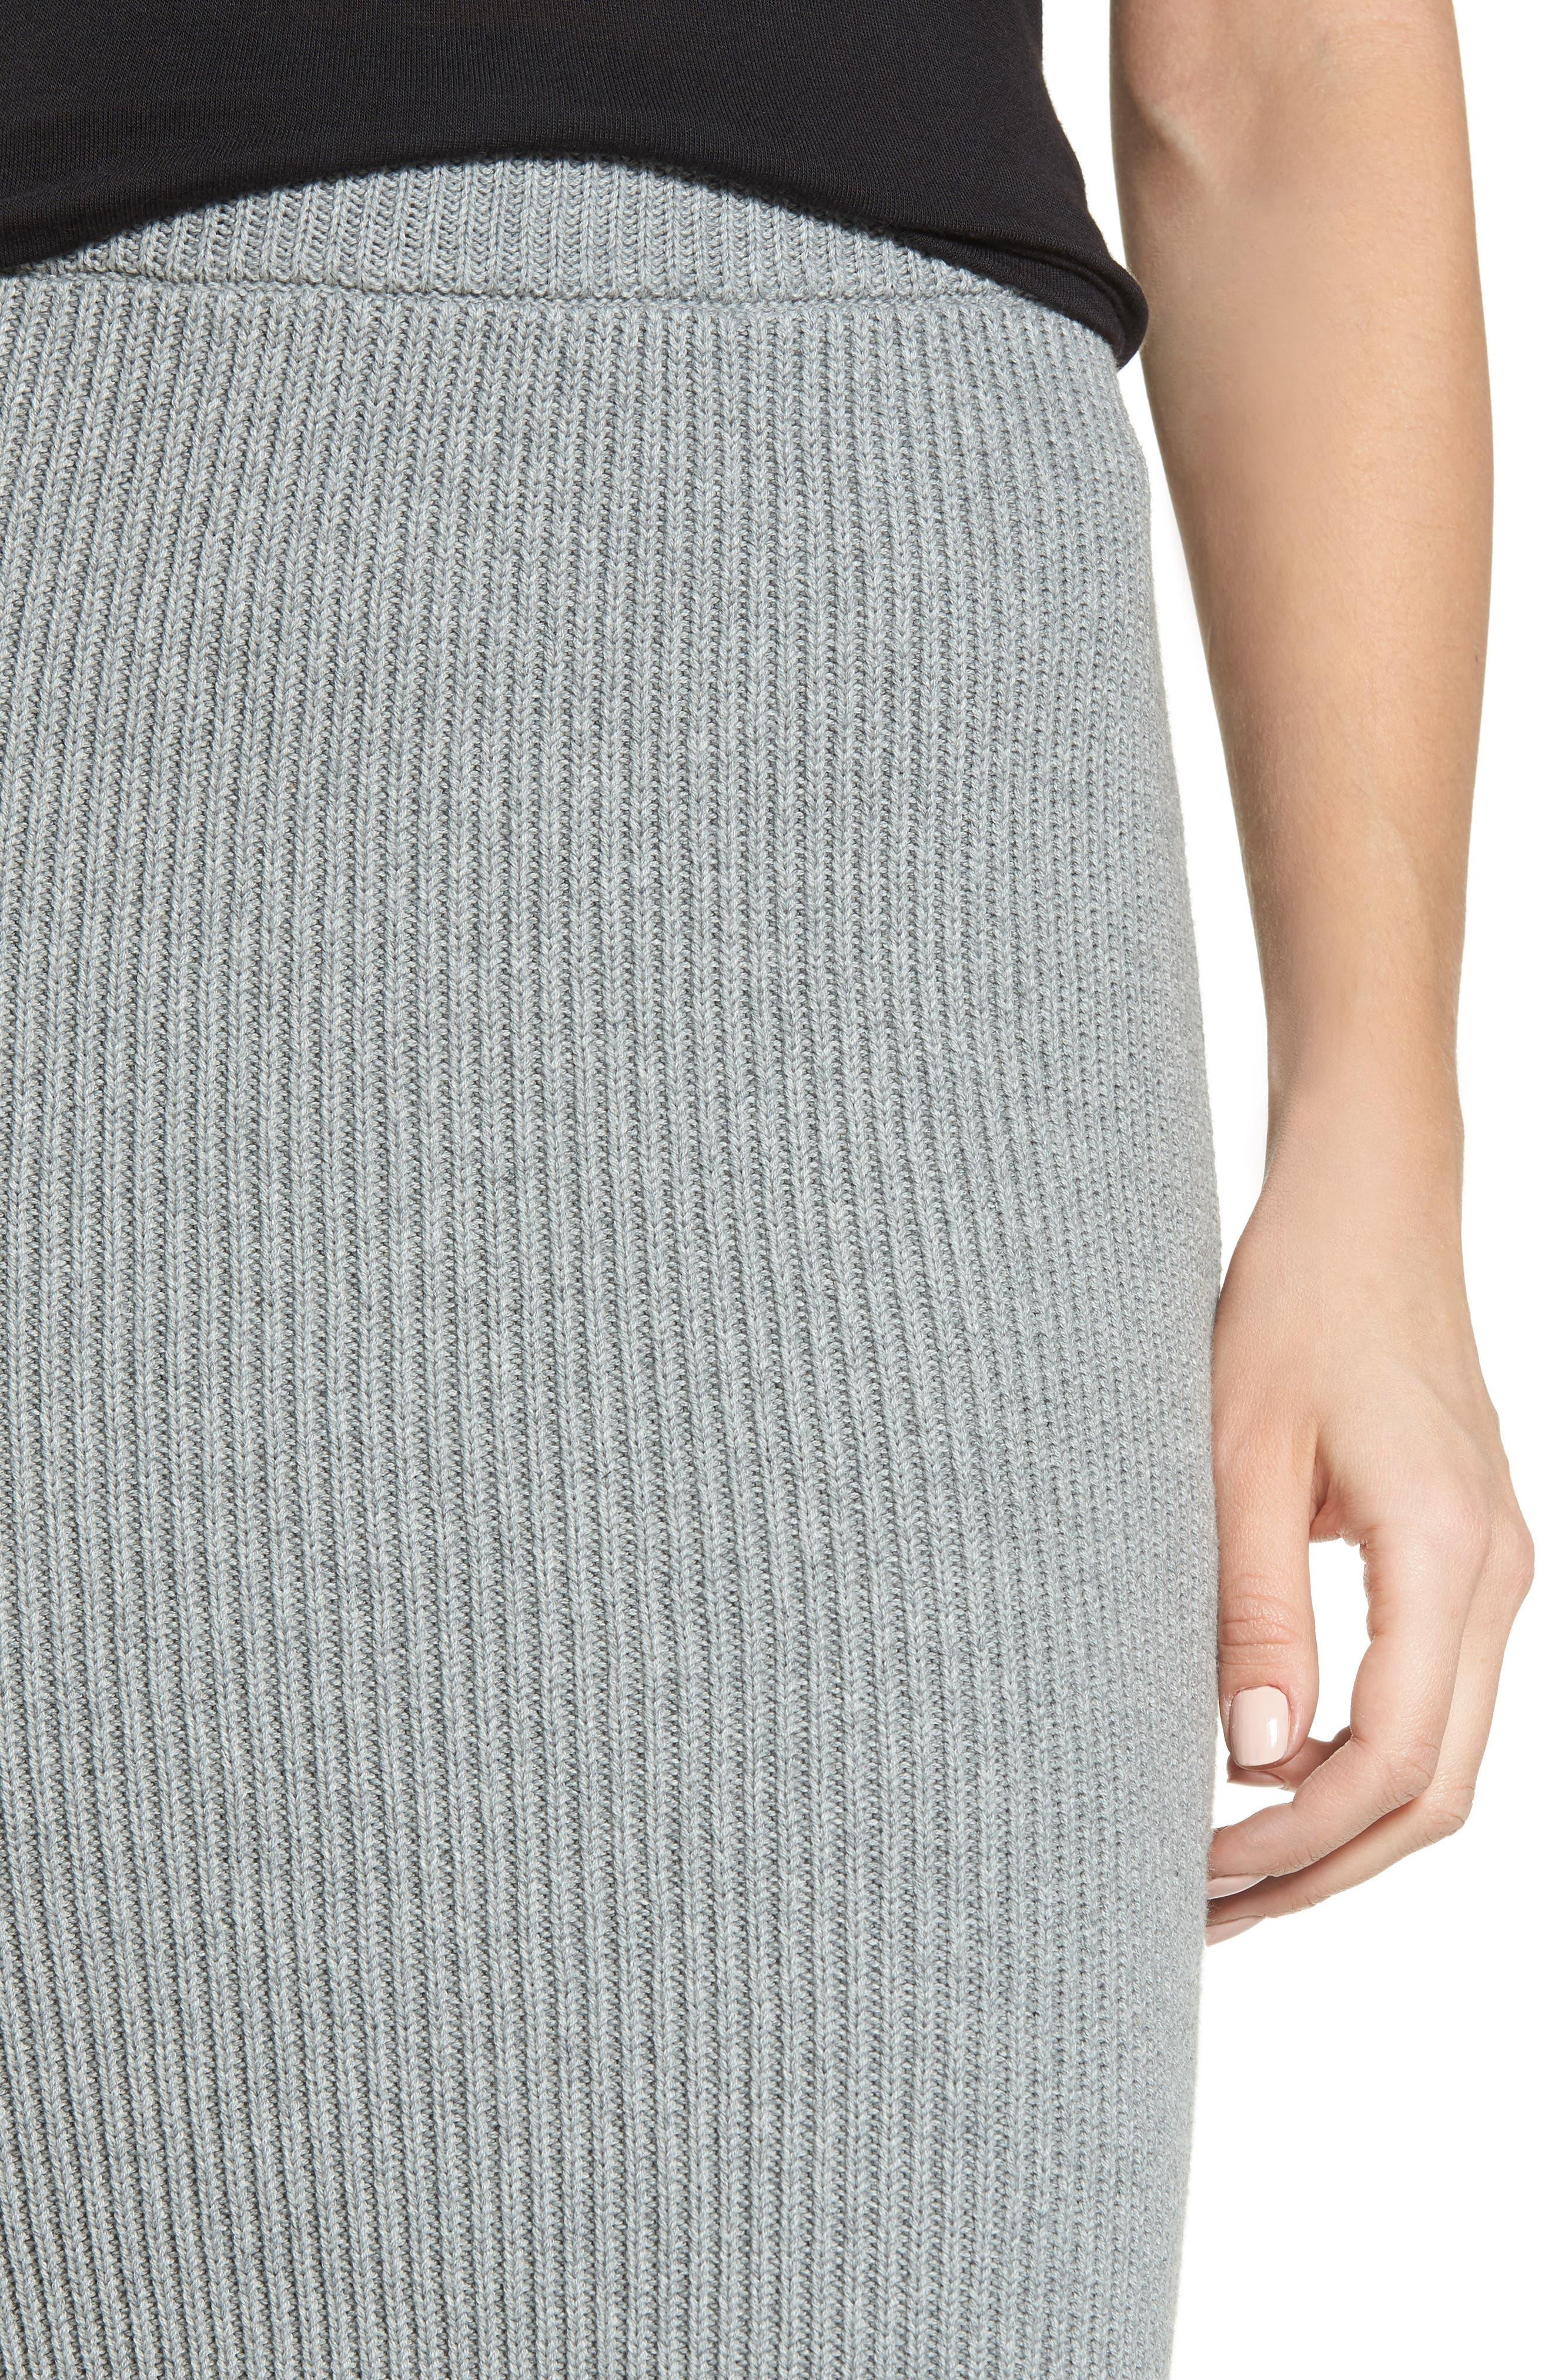 Galactic Knit Skirt,                             Alternate thumbnail 4, color,                             051